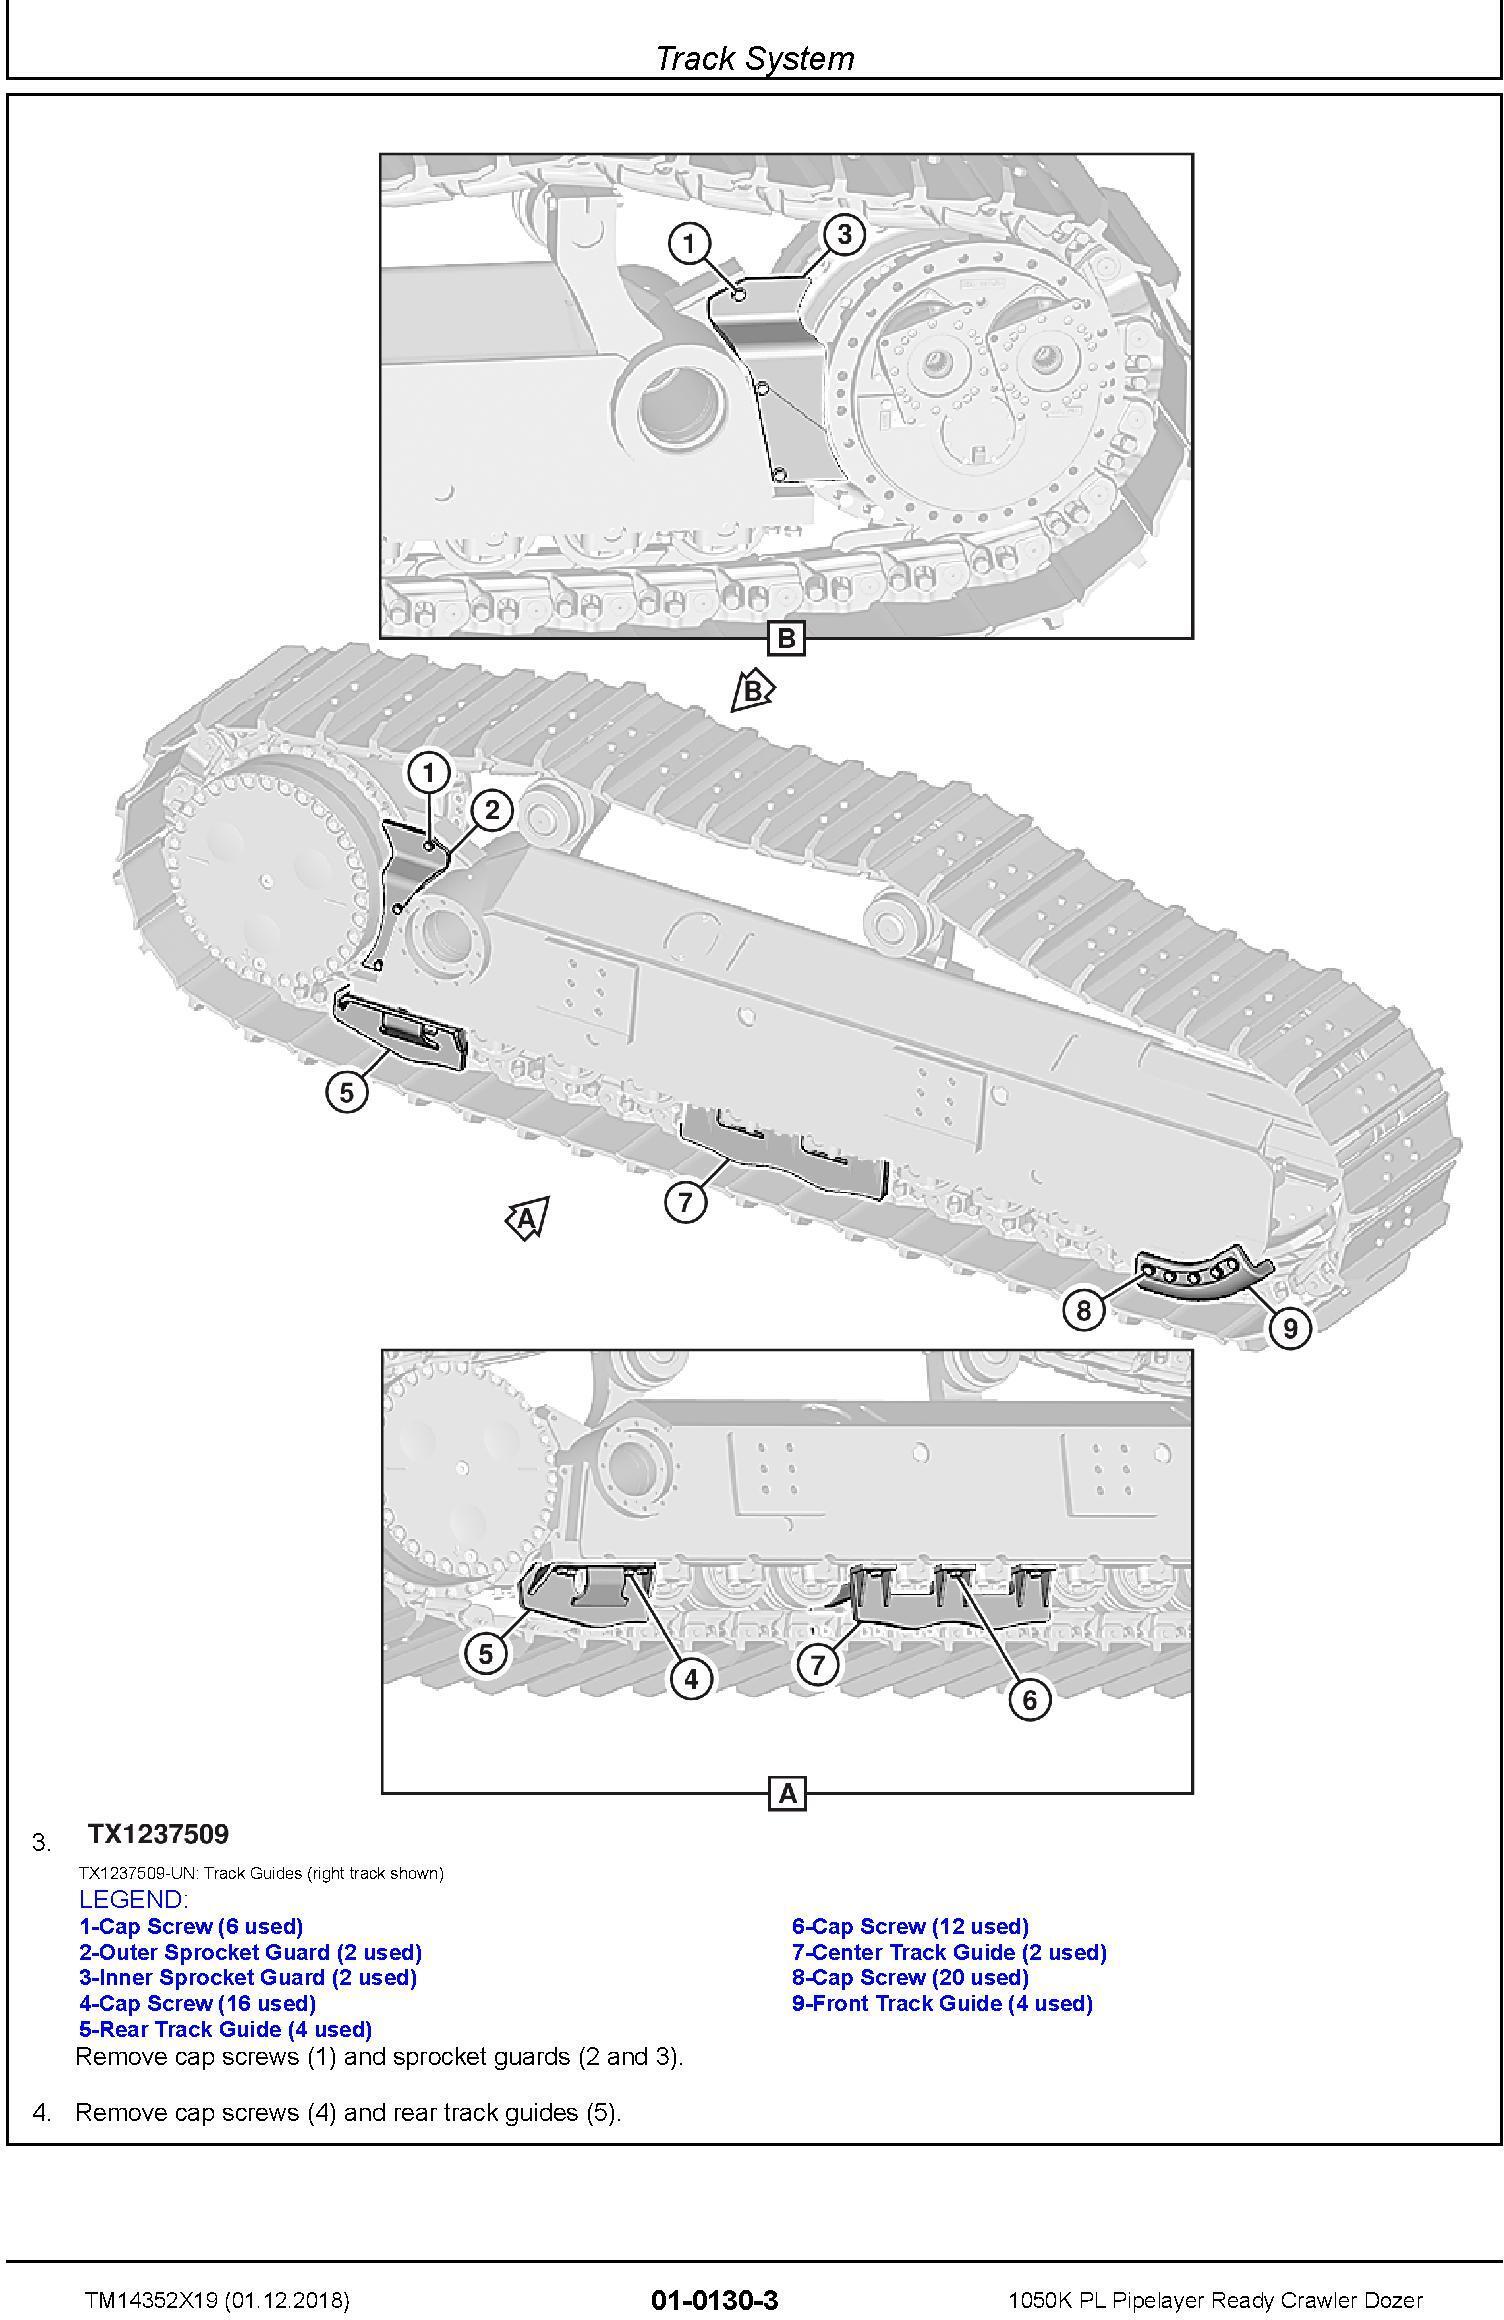 John Deere 1050K PL (SN.F318802-) Pipelayer Ready Crawler Dozer Repair Technical Manual (TM14352X19) - 1